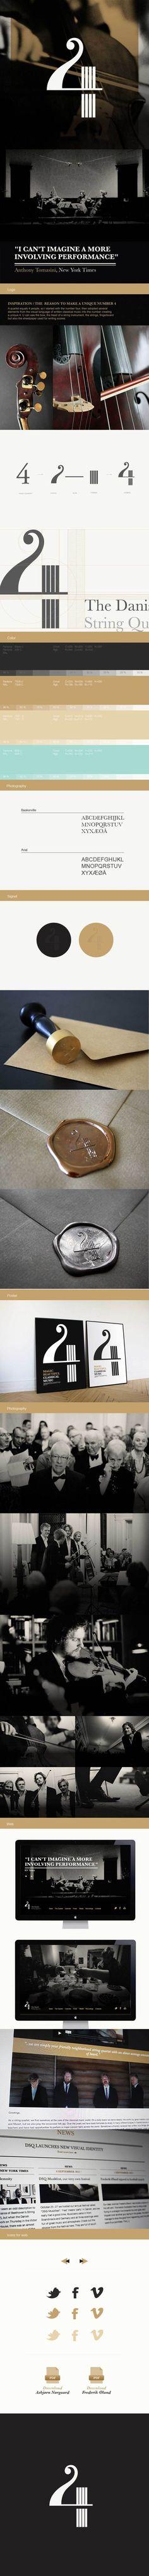 The Danish String Quartet / Corporate identity by Maibritt Lind Hansen, via Behance